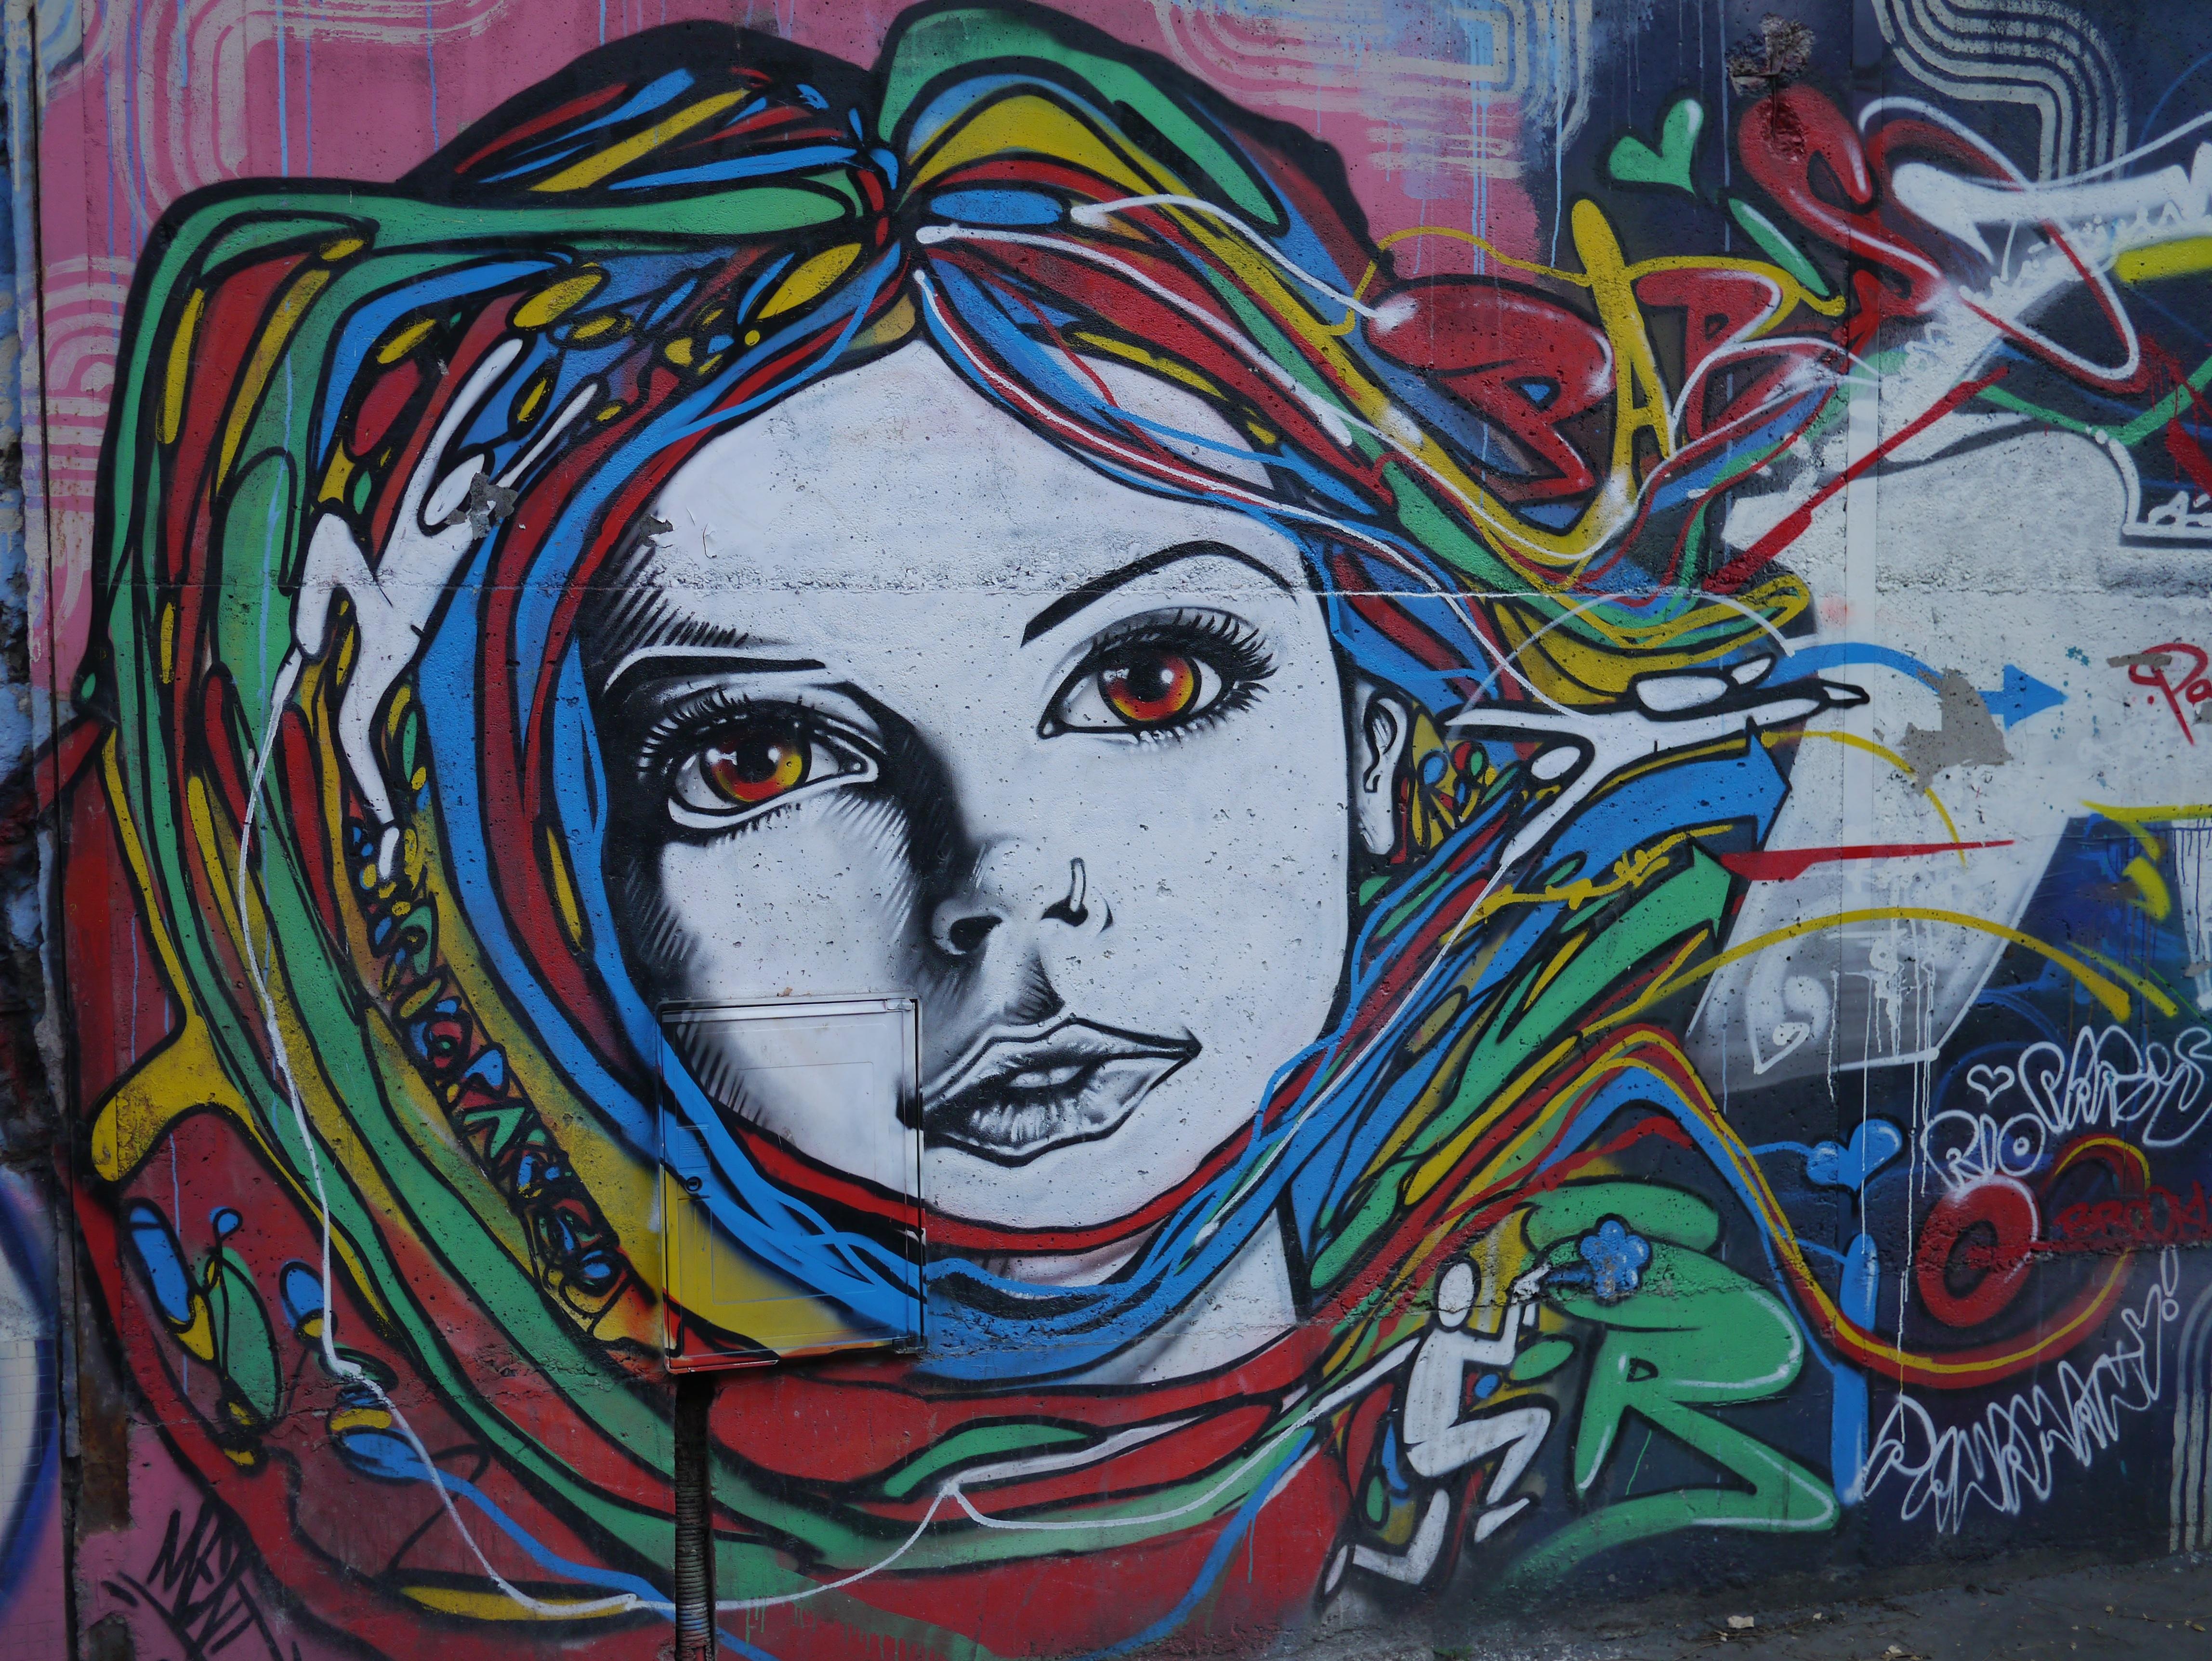 Citaten Kunst Yang Bagus : Gambar orang gadis coretan seni jalanan